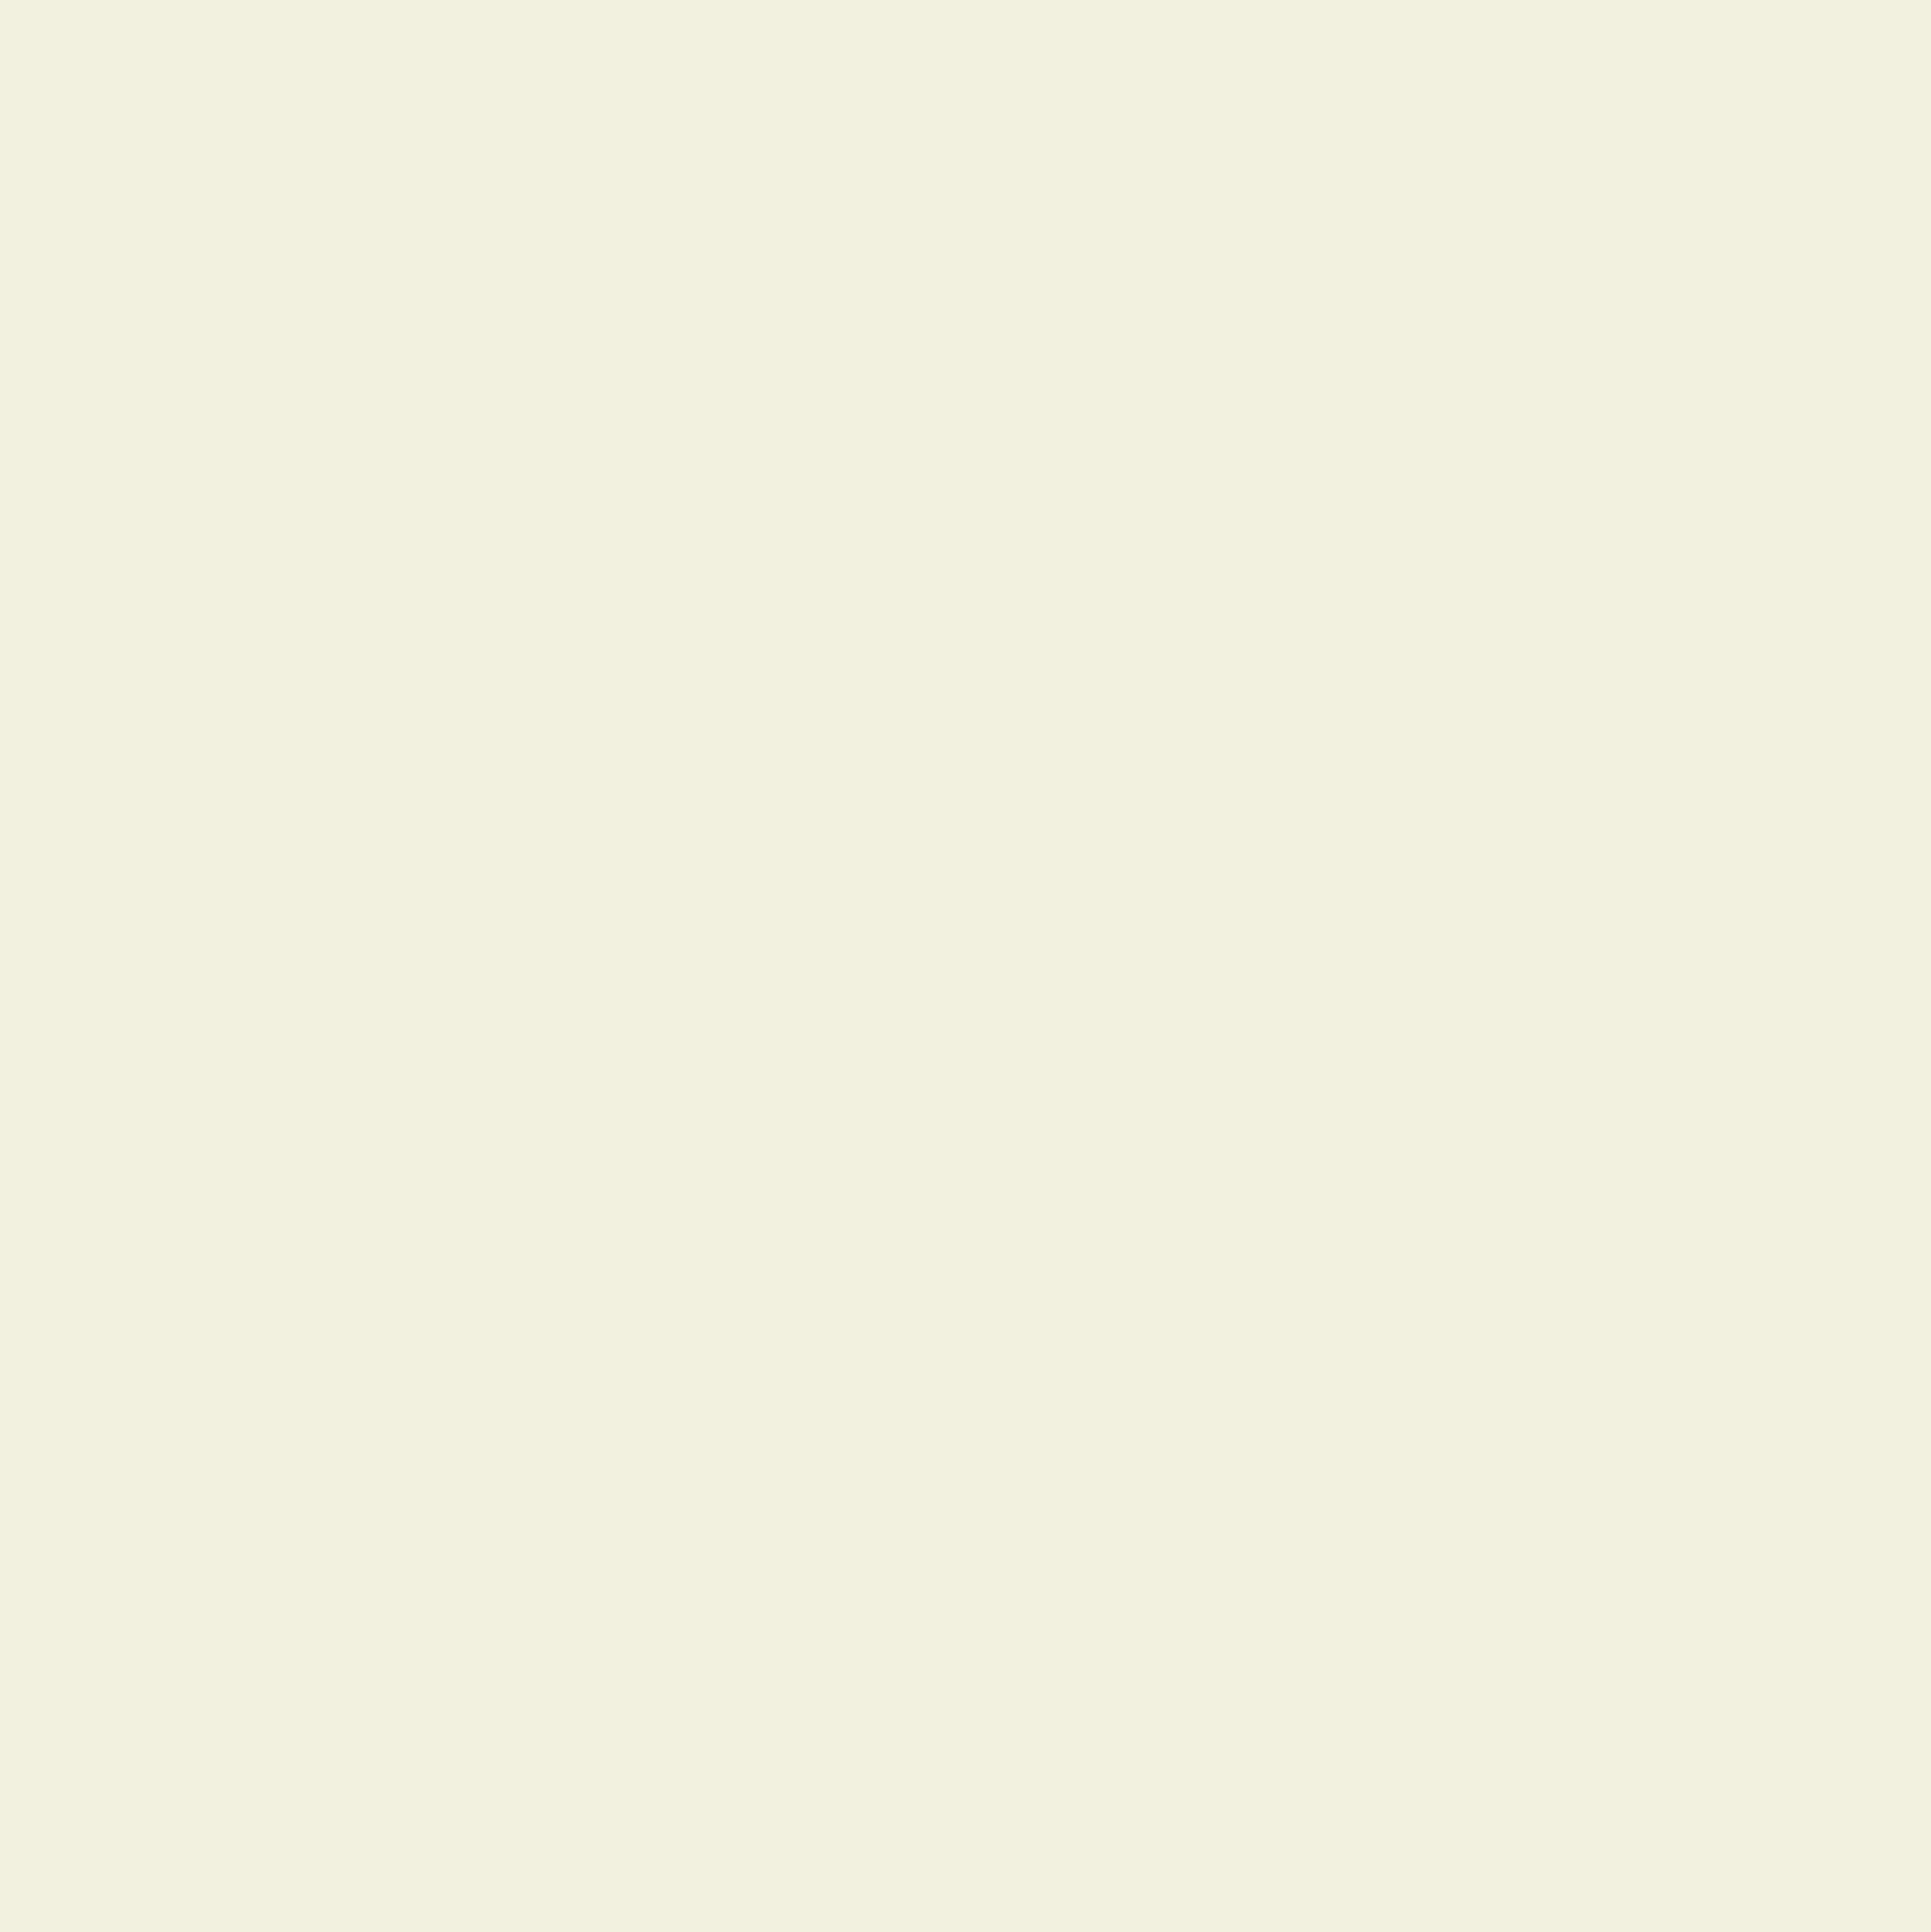 Mantel CRUDOColorLiso Rectangular 1,5x2,4m [retirooenvíoen 5·7díashábiles]